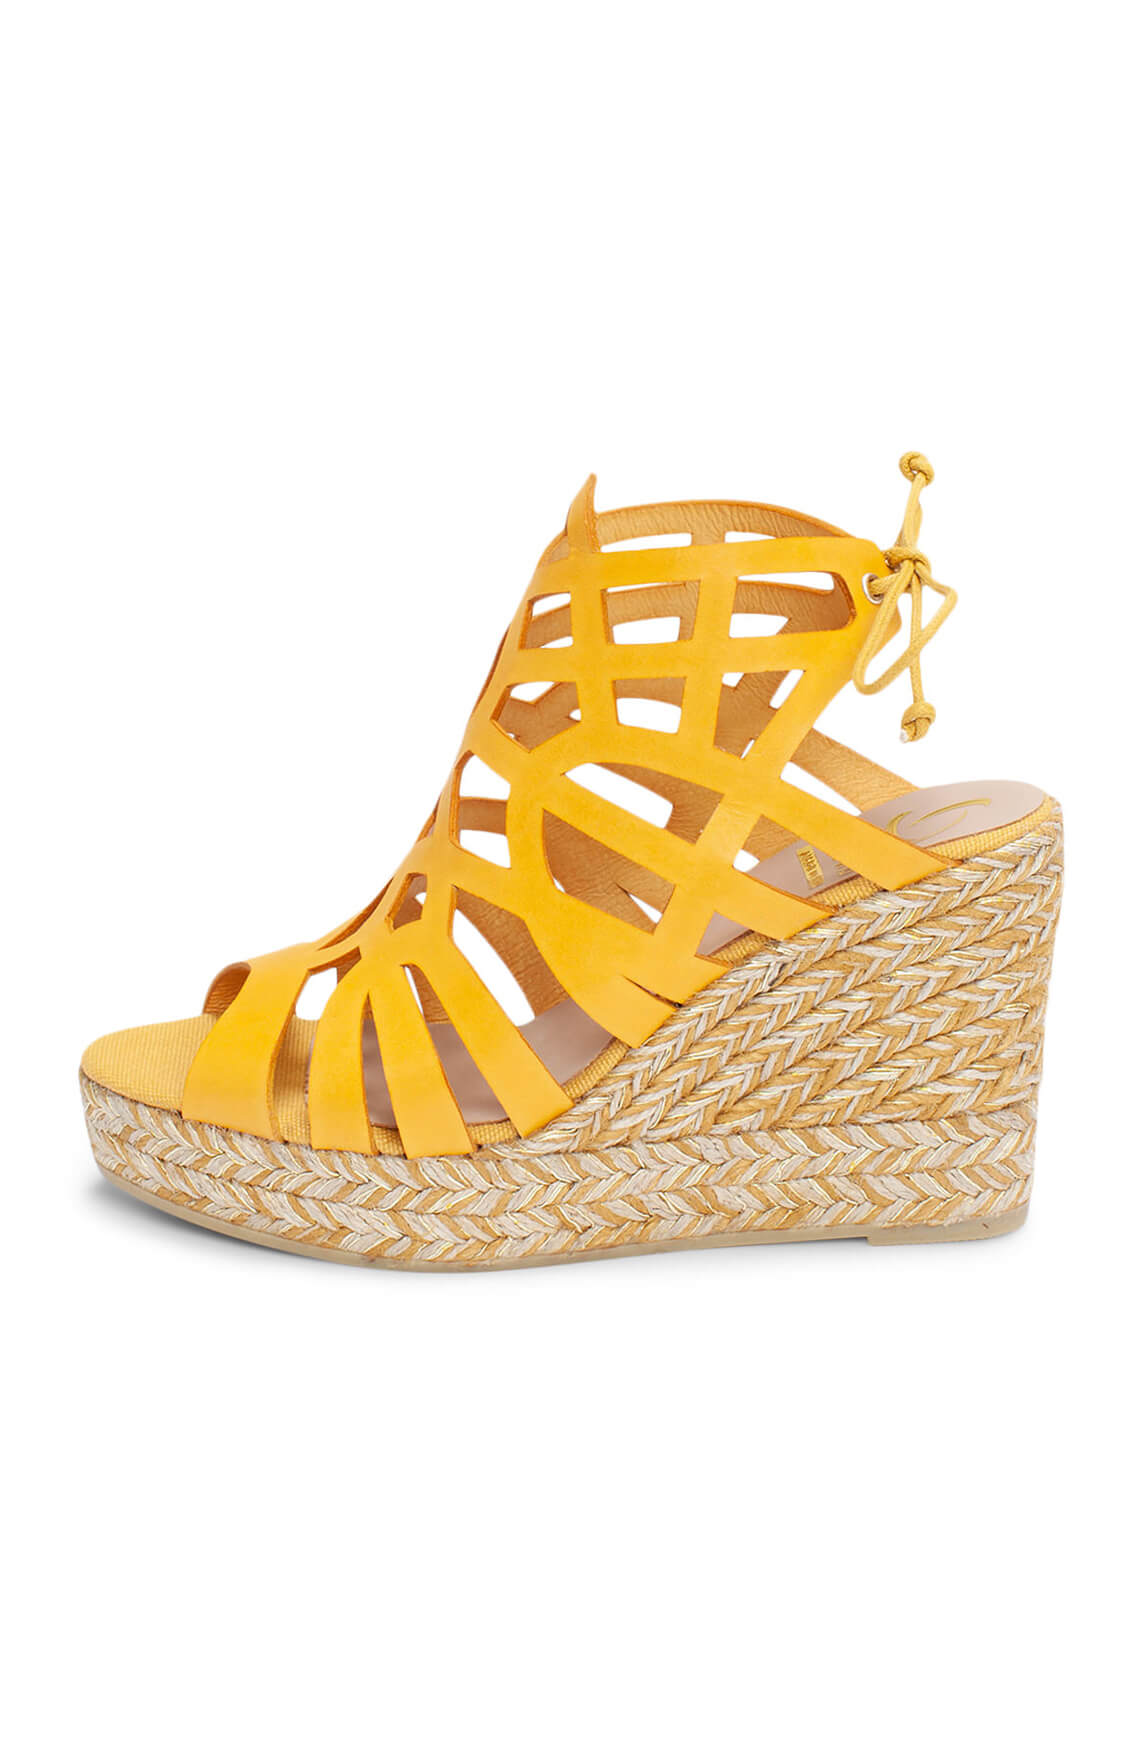 Kanna Dames Sleehak geel